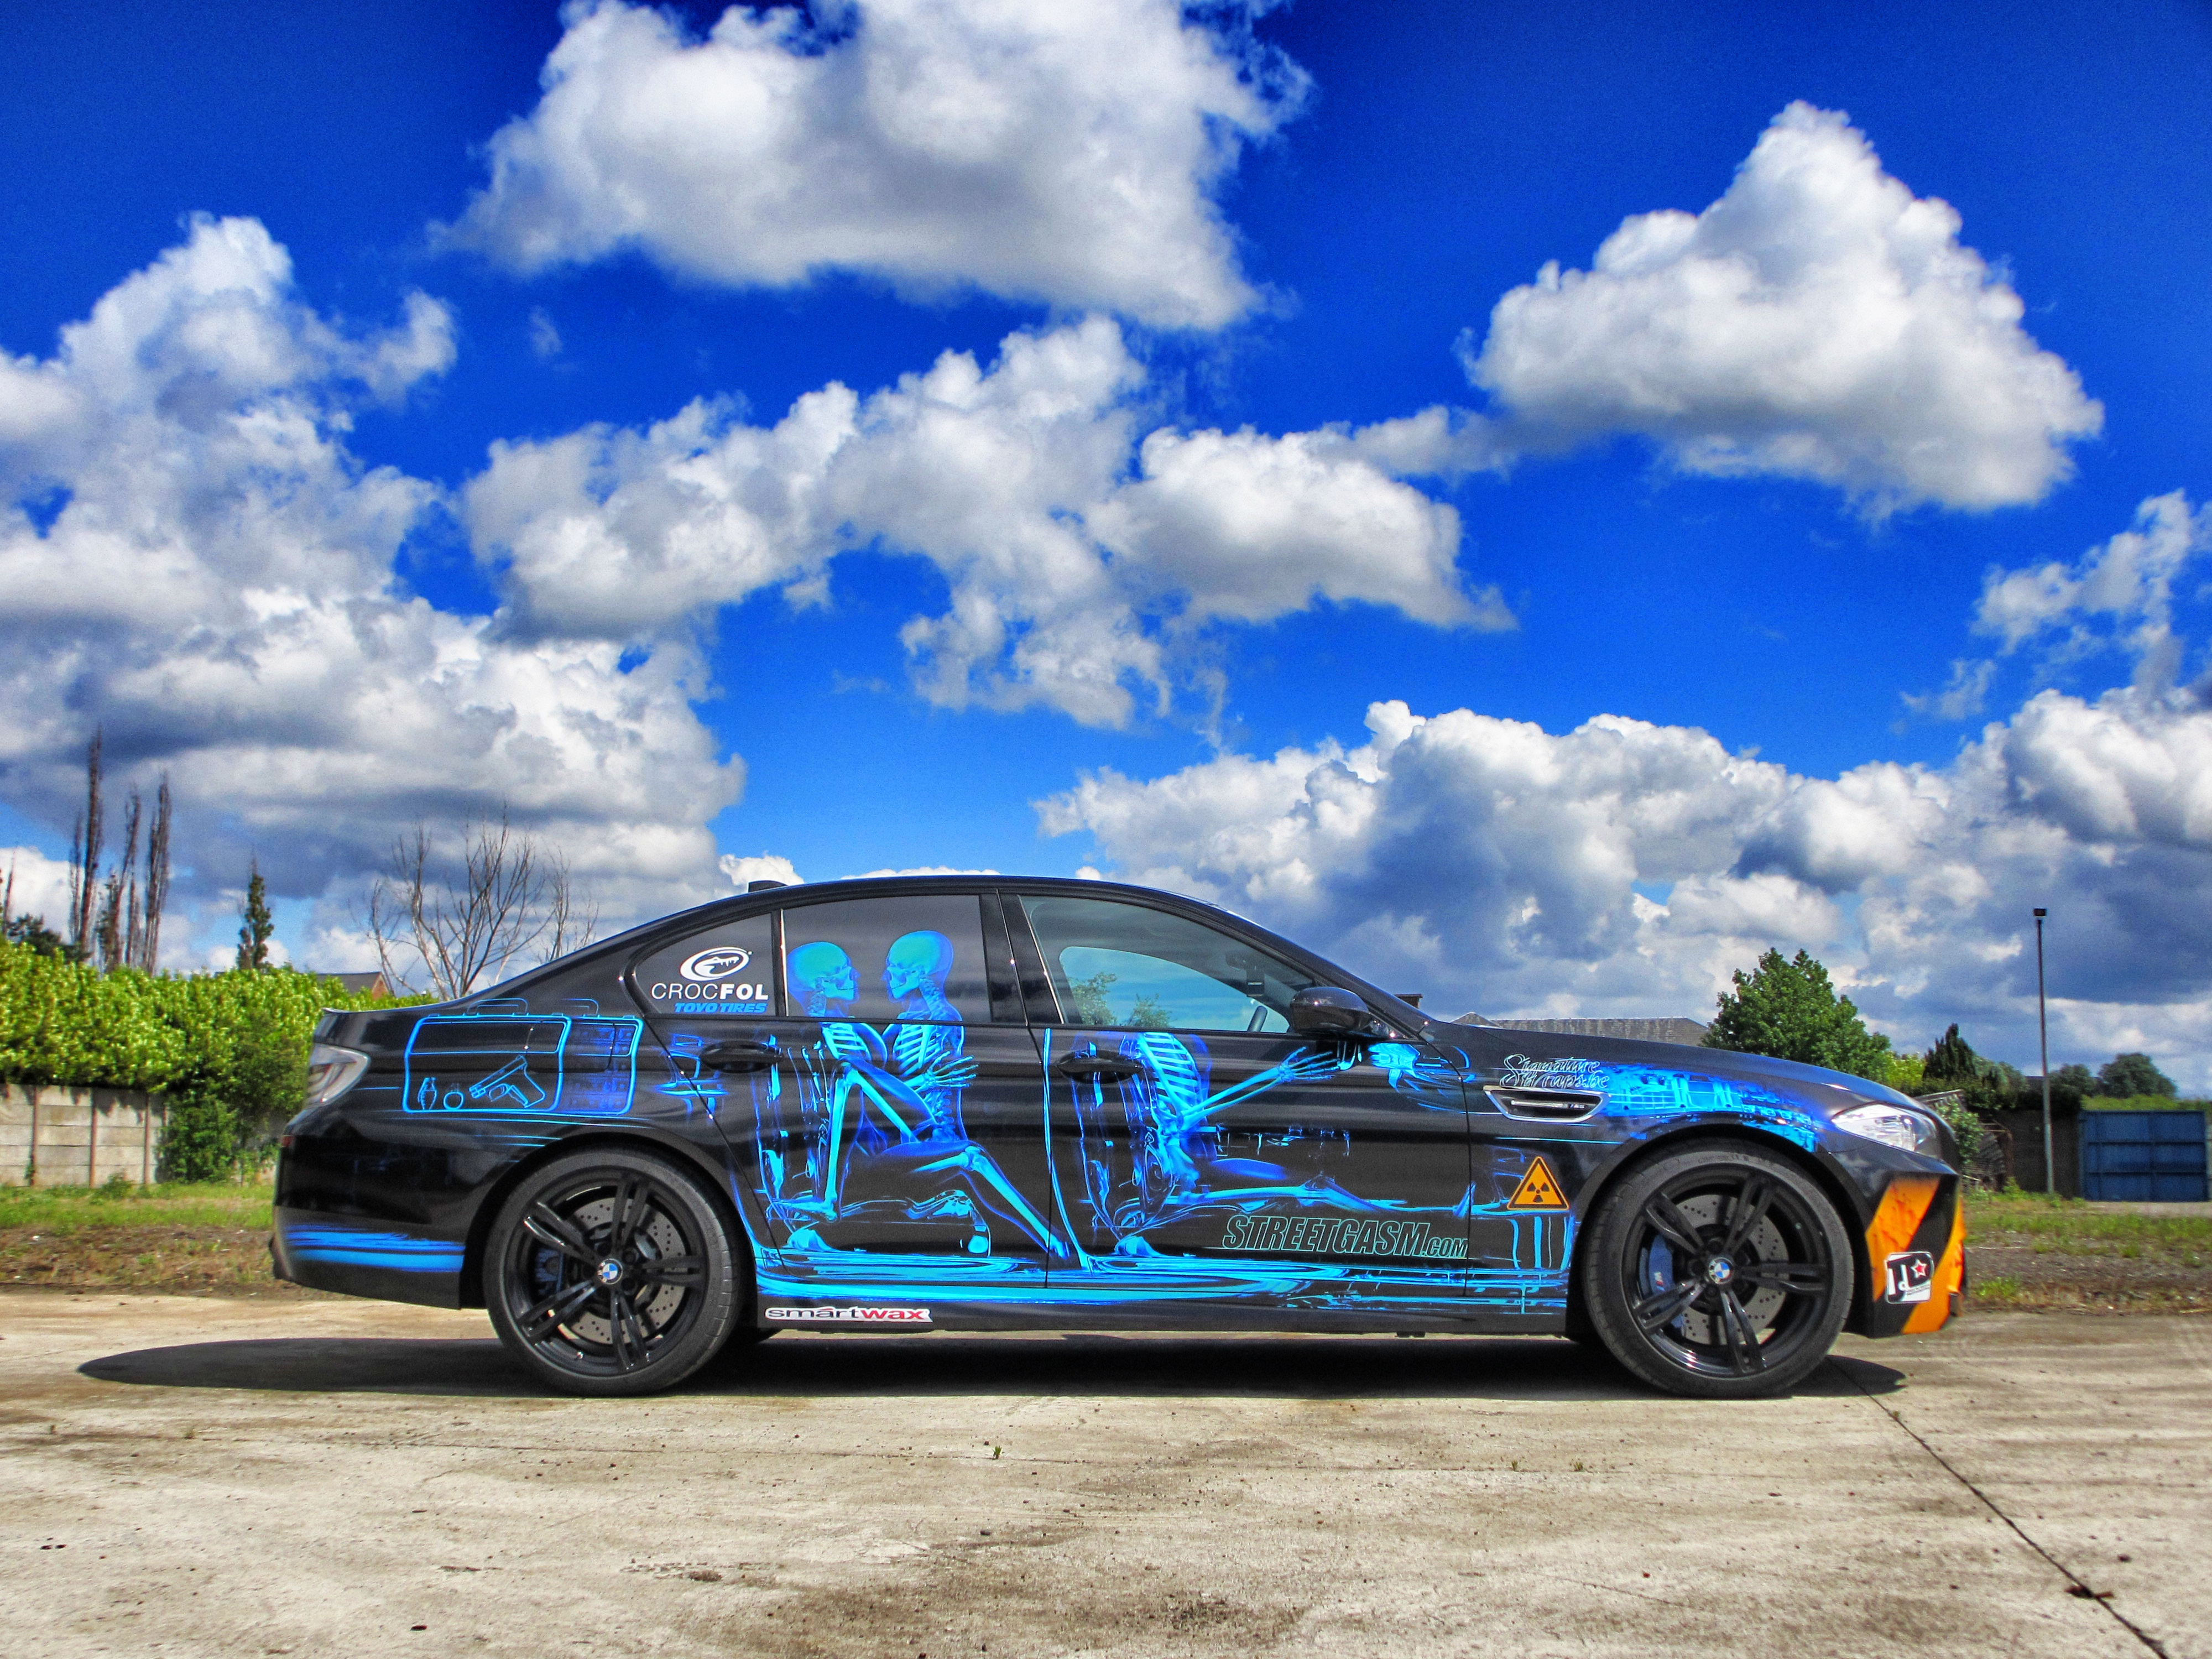 BMW M5 Xray carwrap design